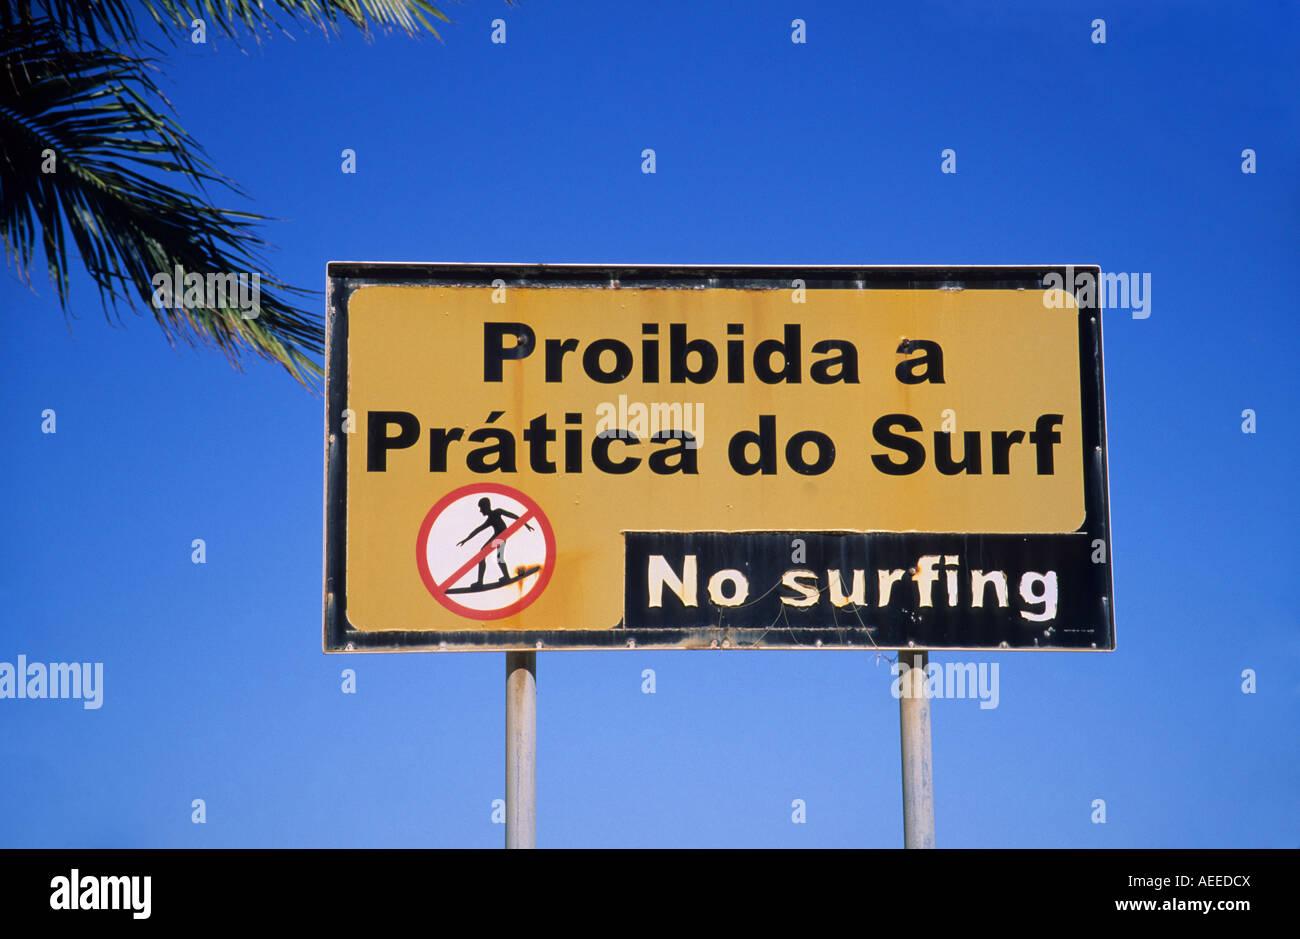 Portuguese And English Stock Photos & Portuguese And English